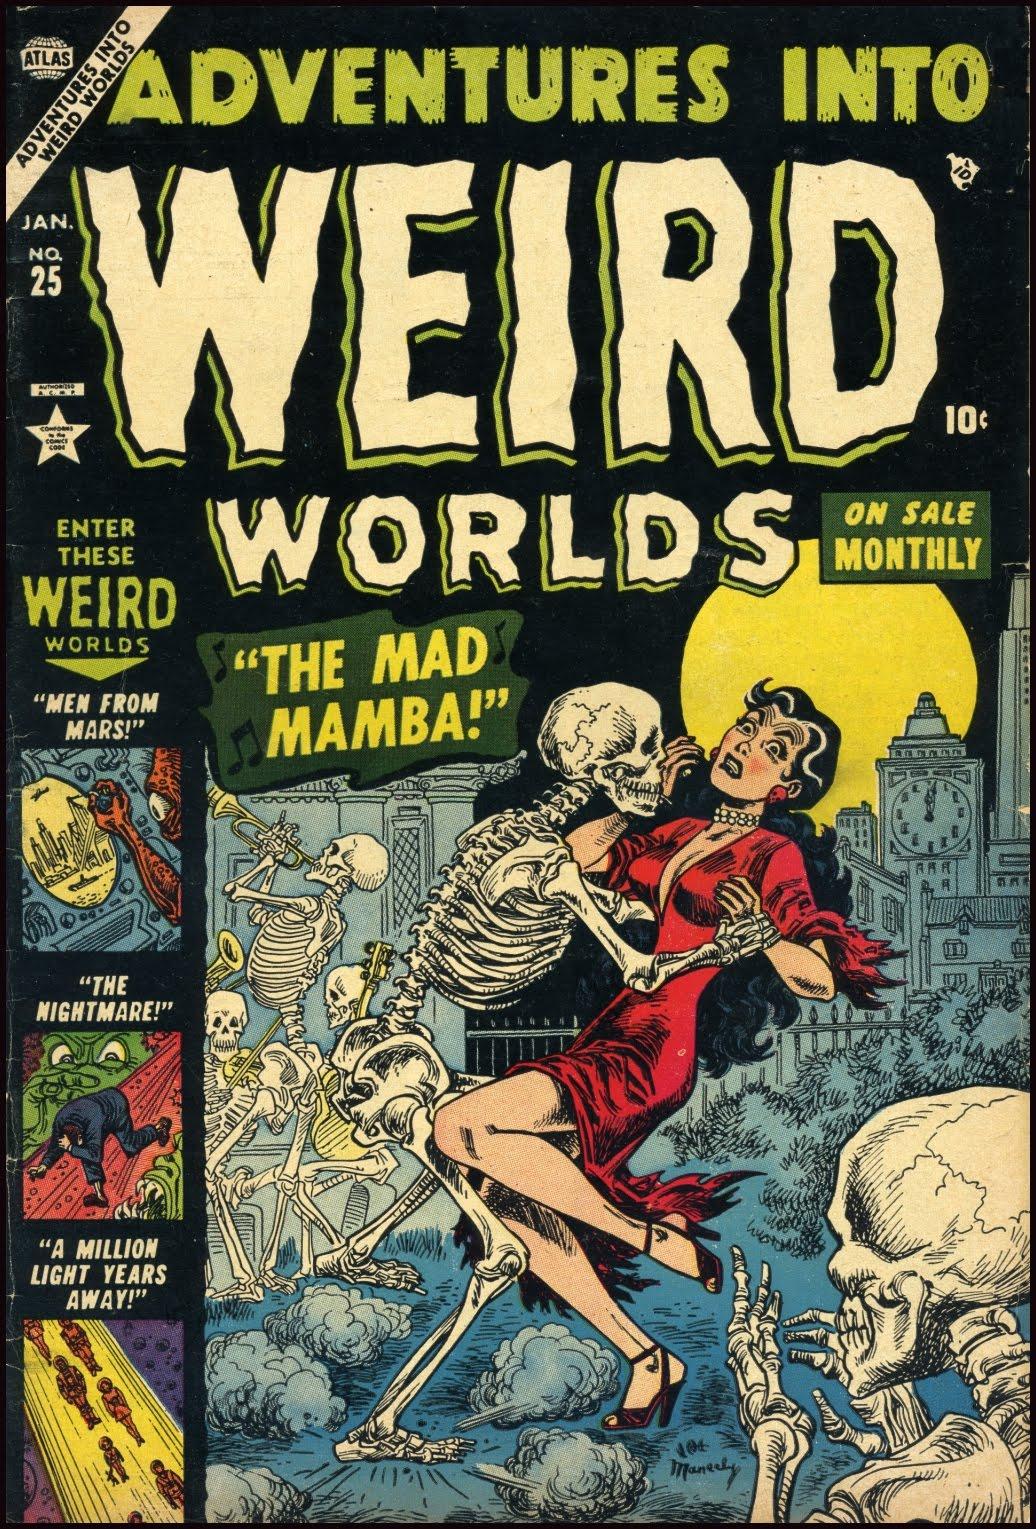 Read online Adventures into Weird Worlds comic -  Issue #25 - 1